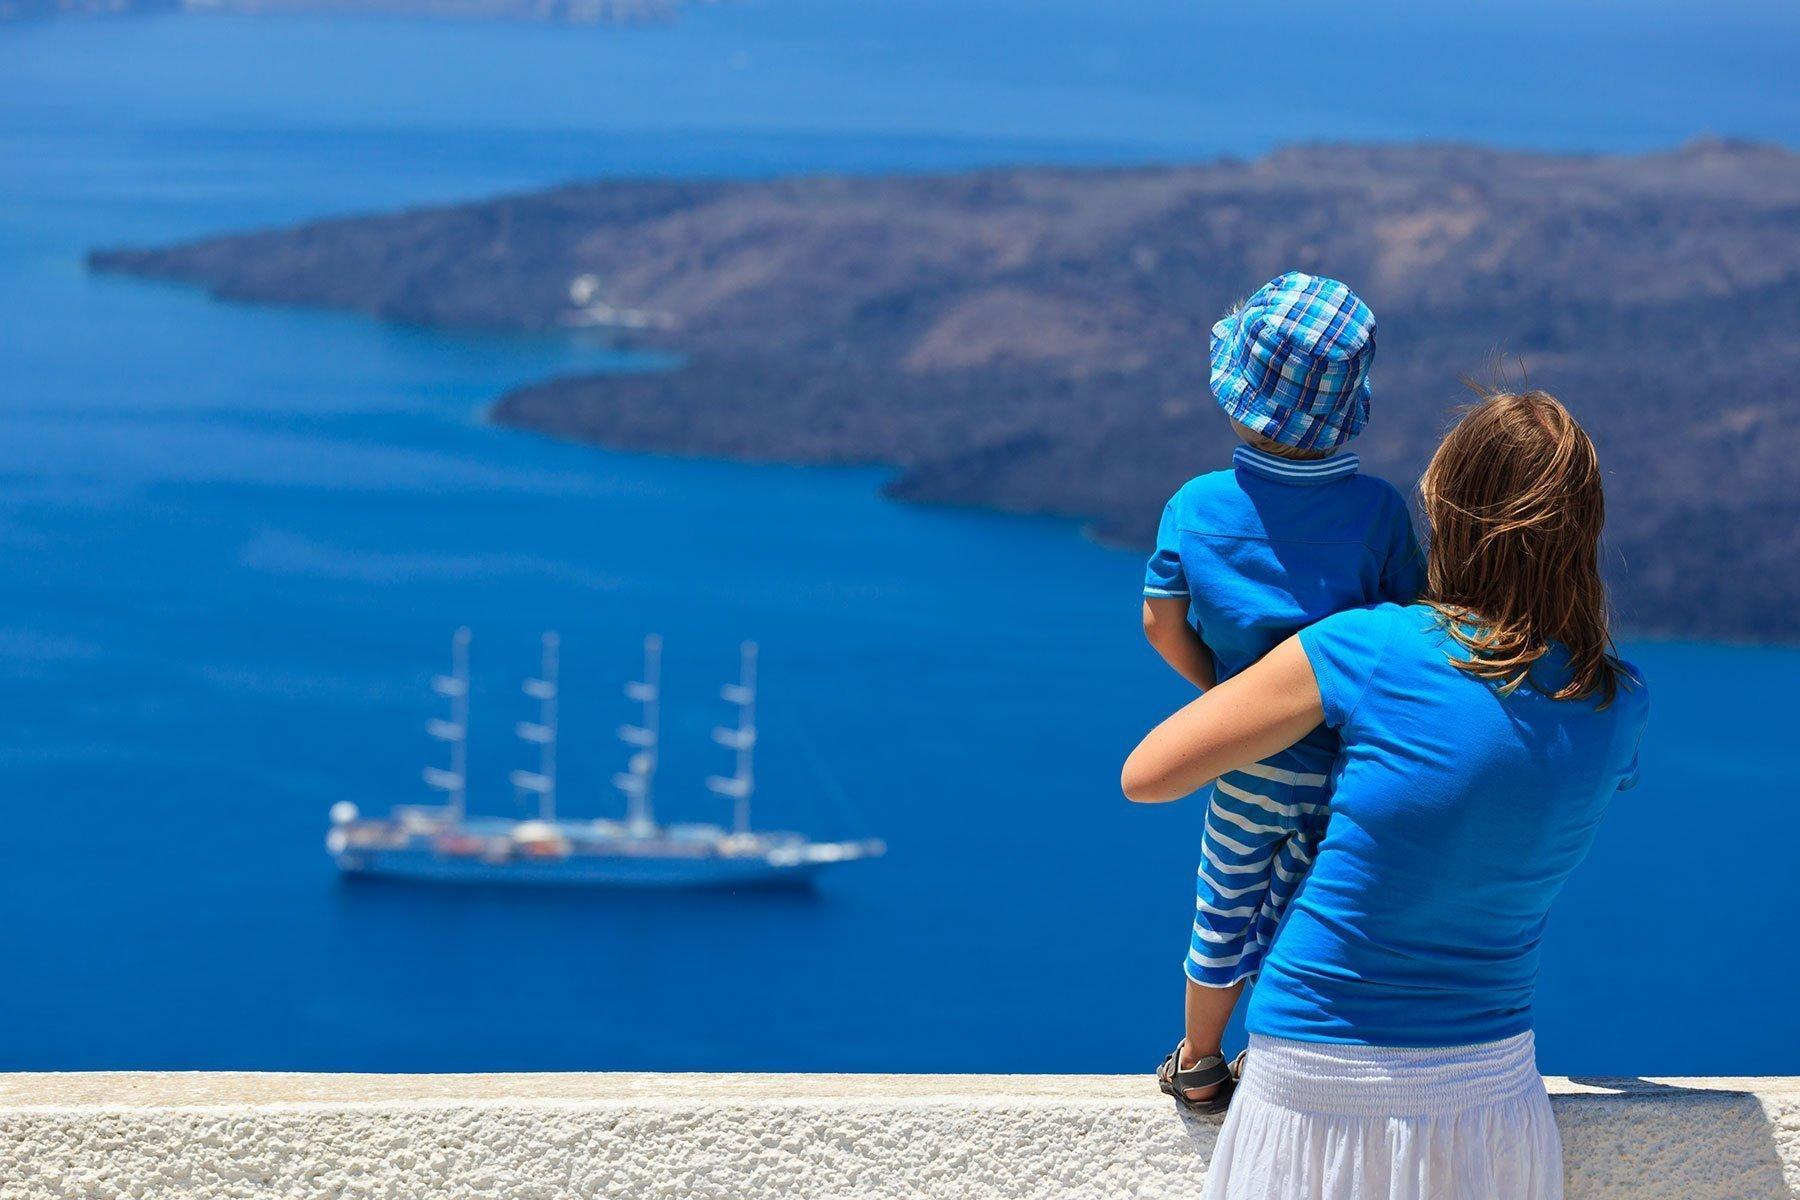 Guardian: Η Ελλάδα ετοιμάζει νέους κανόνες για διακοπές και τουρισμό